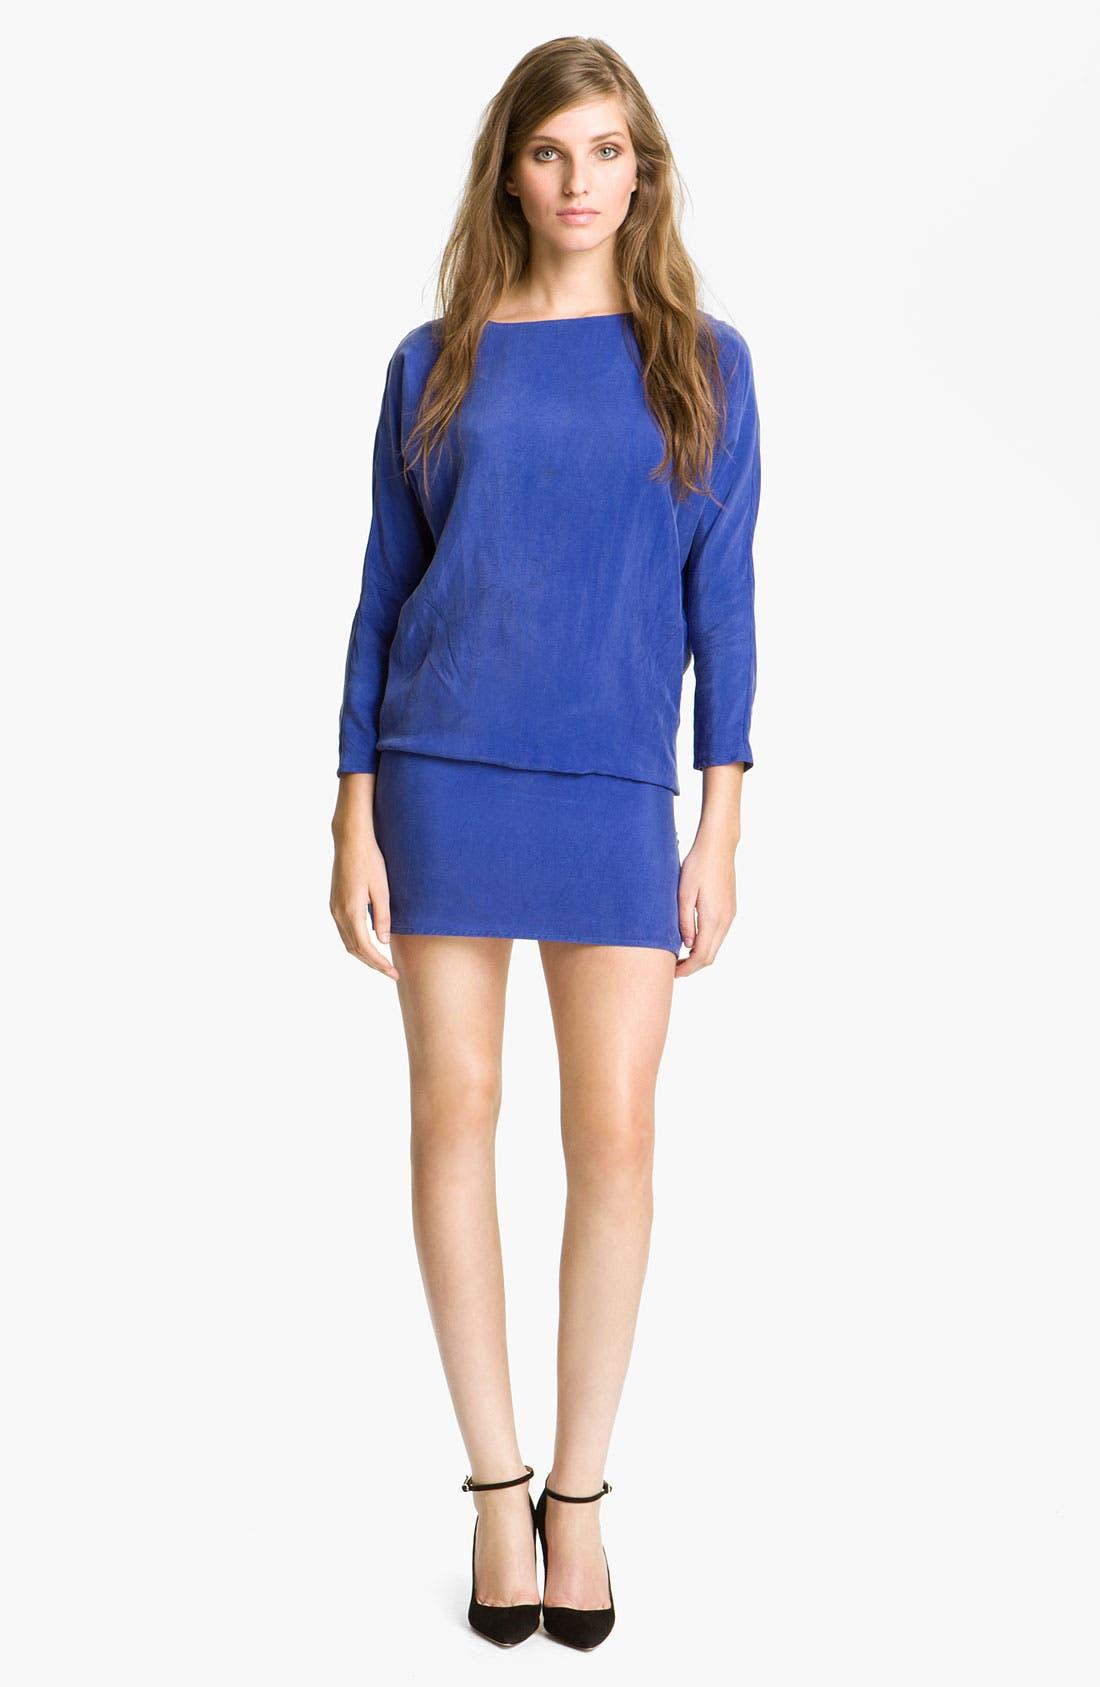 Main Image - Kelly Wearstler 'Eden' Dolman Sleeve Tunic Dress